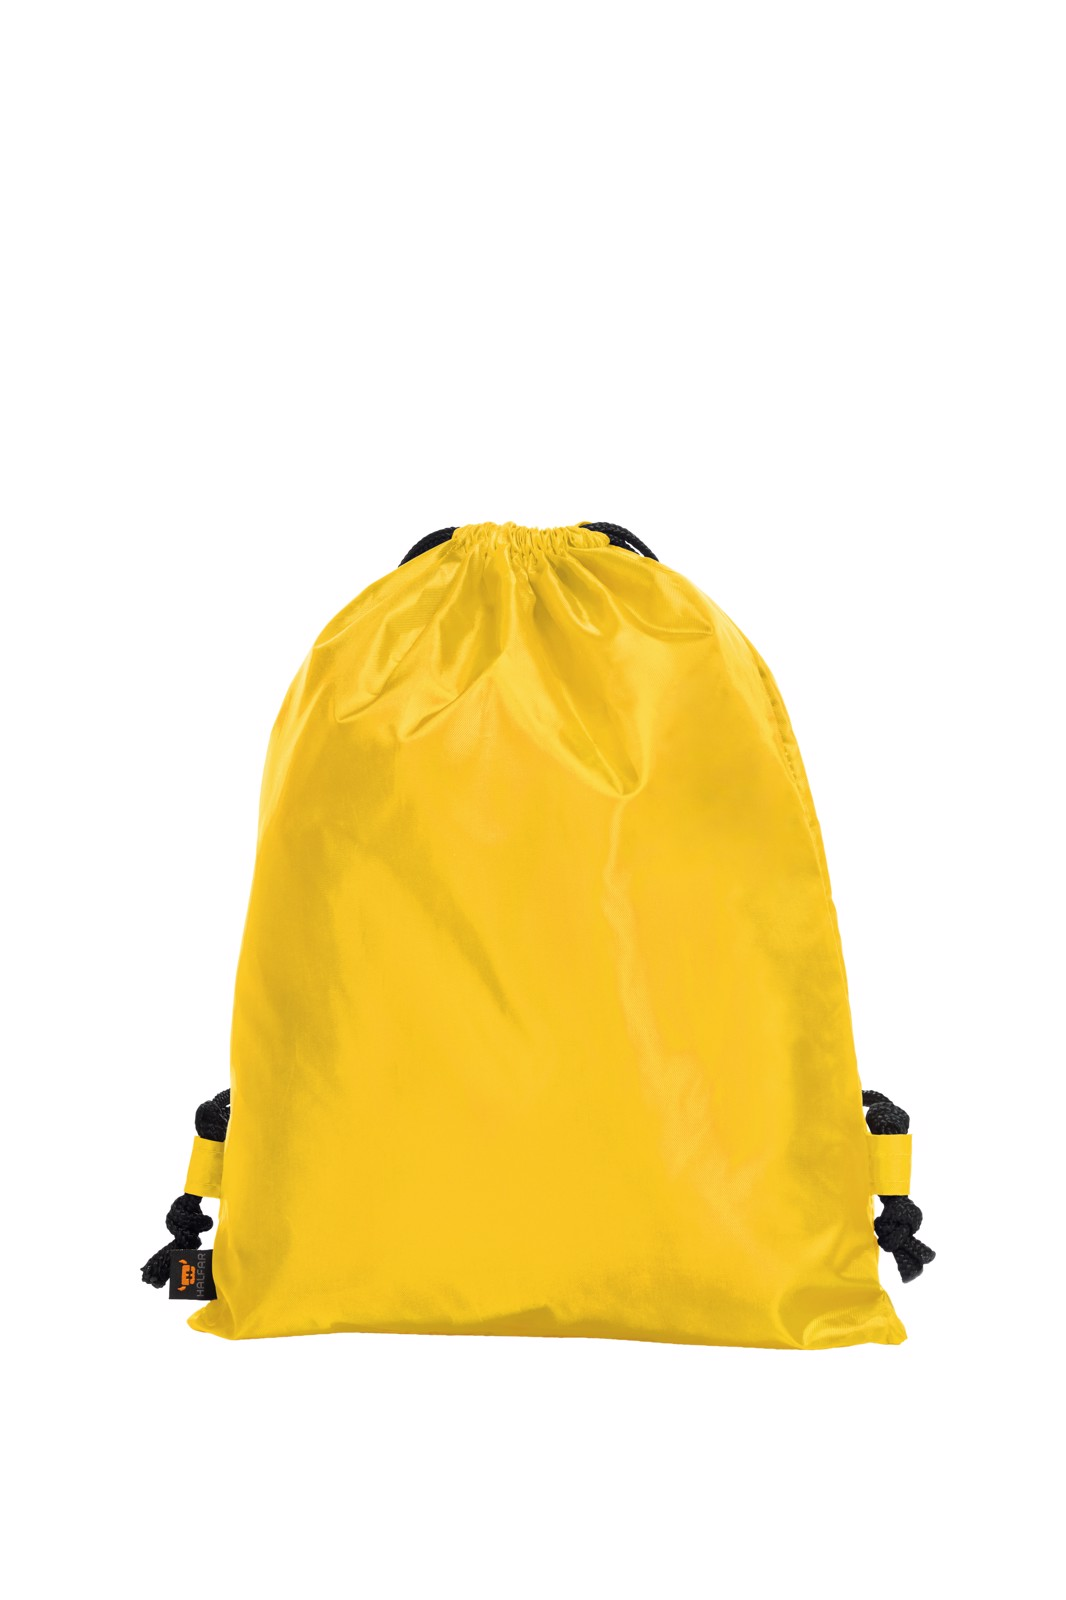 Batoh Taft Sport - Žlutá